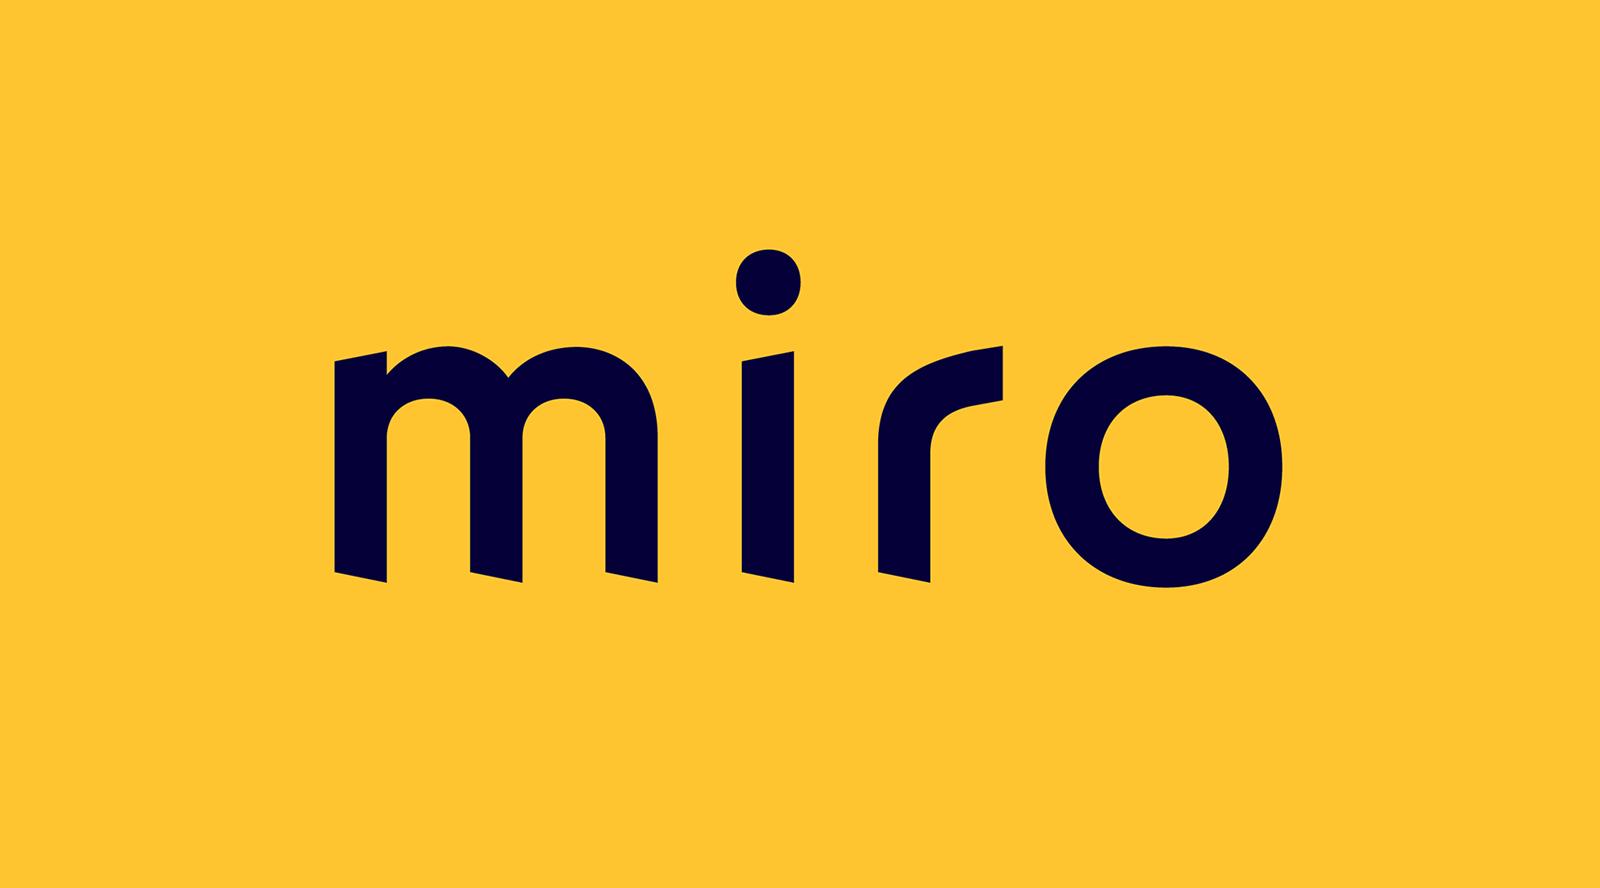 RealtimeBoard更名miro并启用全新的品牌logo和vi形象设计-深圳vi设计2